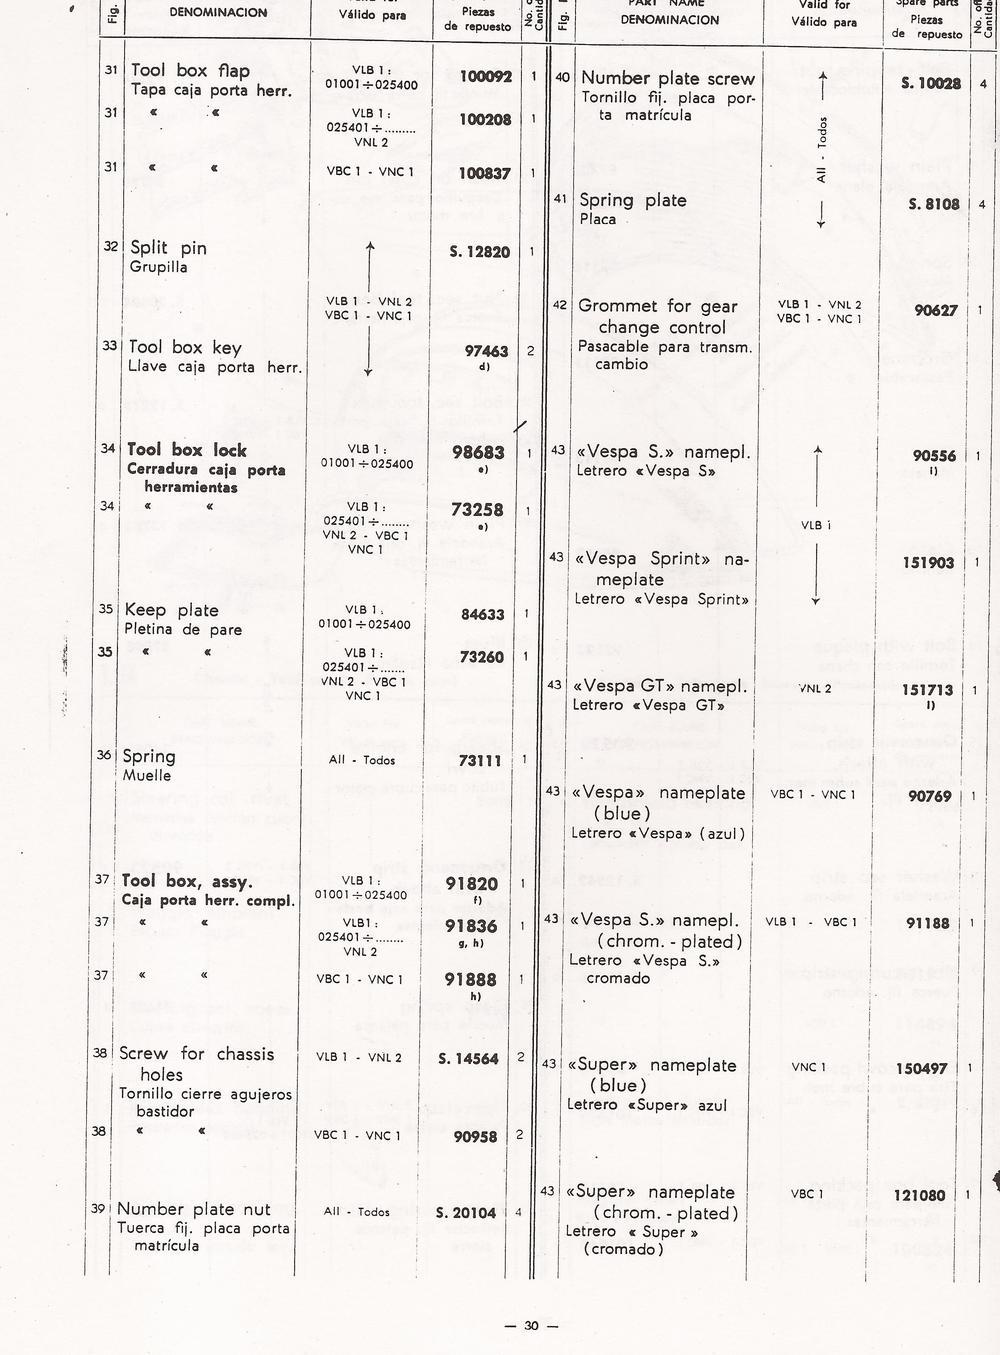 02-25-2013 vespa manaul 35.jpg